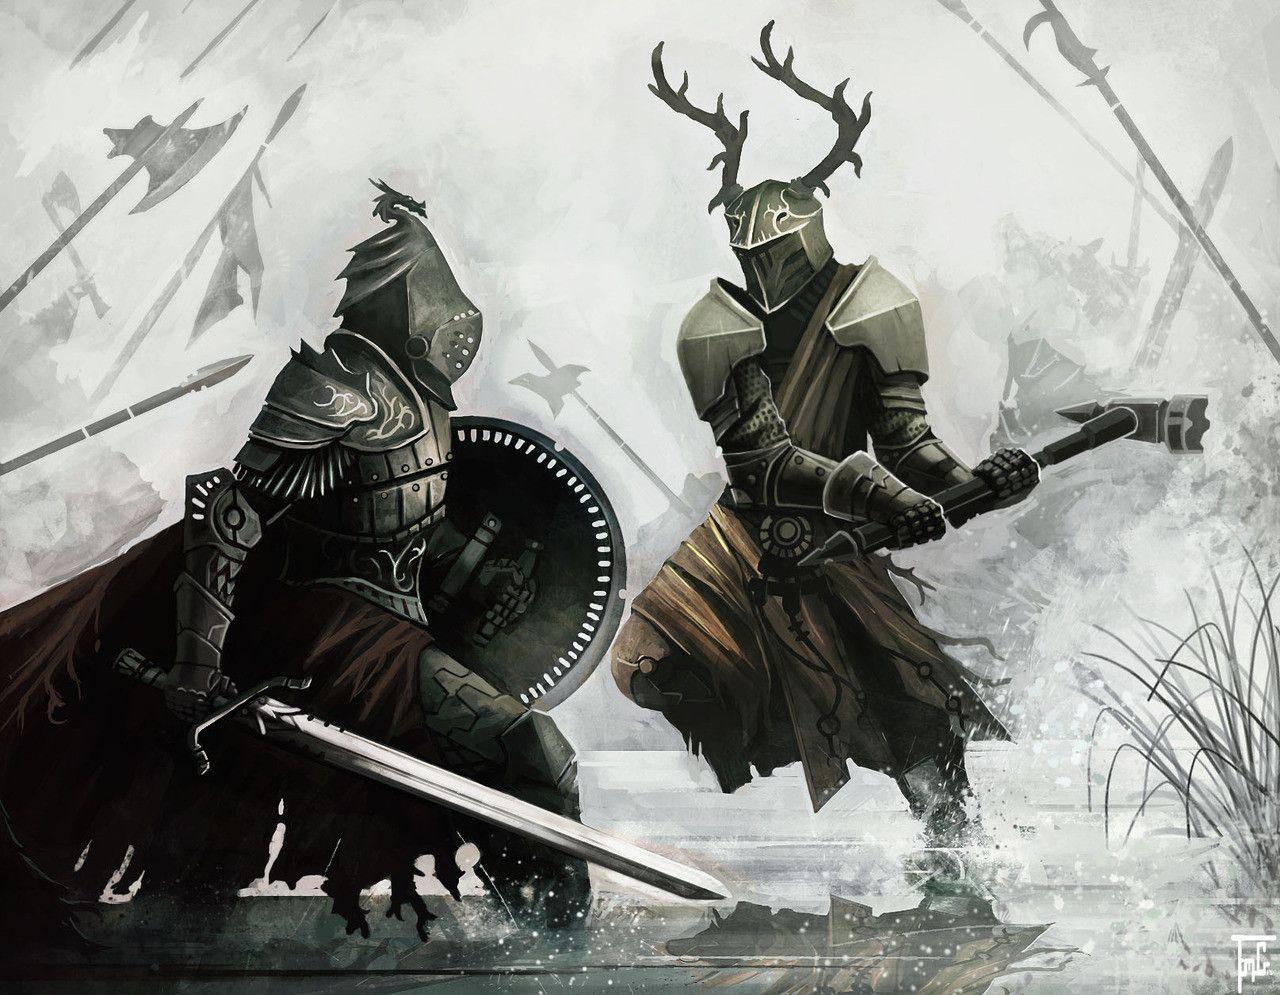 Robert Baratheon And Rhaegar Targaryen At The Battle Of The Trident By Njoo Description From Pinterest Game Of Thrones Artwork Game Of Thrones Art Asoiaf Art